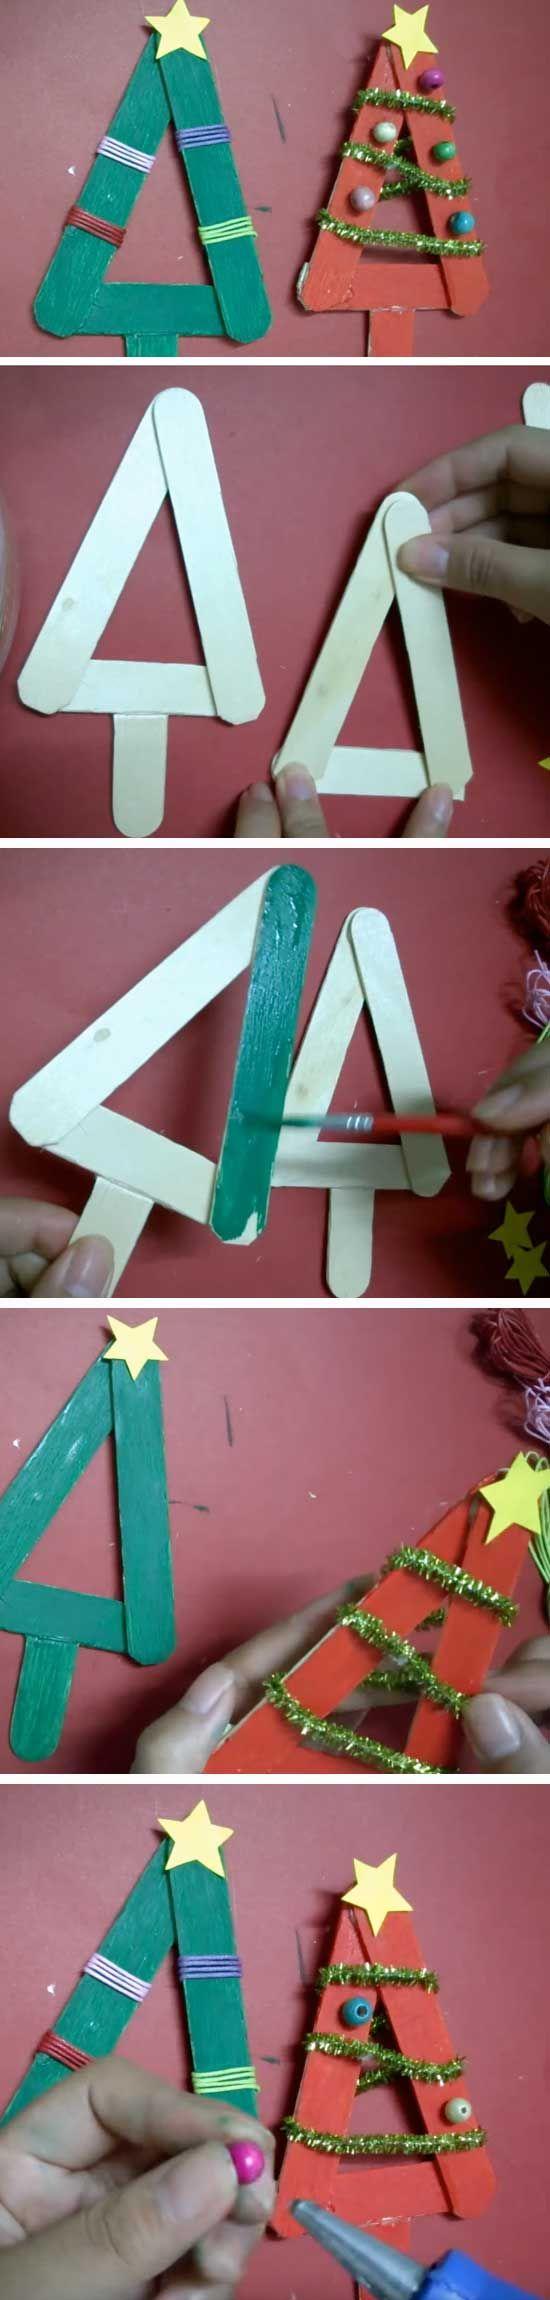 Christmas Trees | 16 DIY Christmas Popsicle Sticks Crafts for Kids